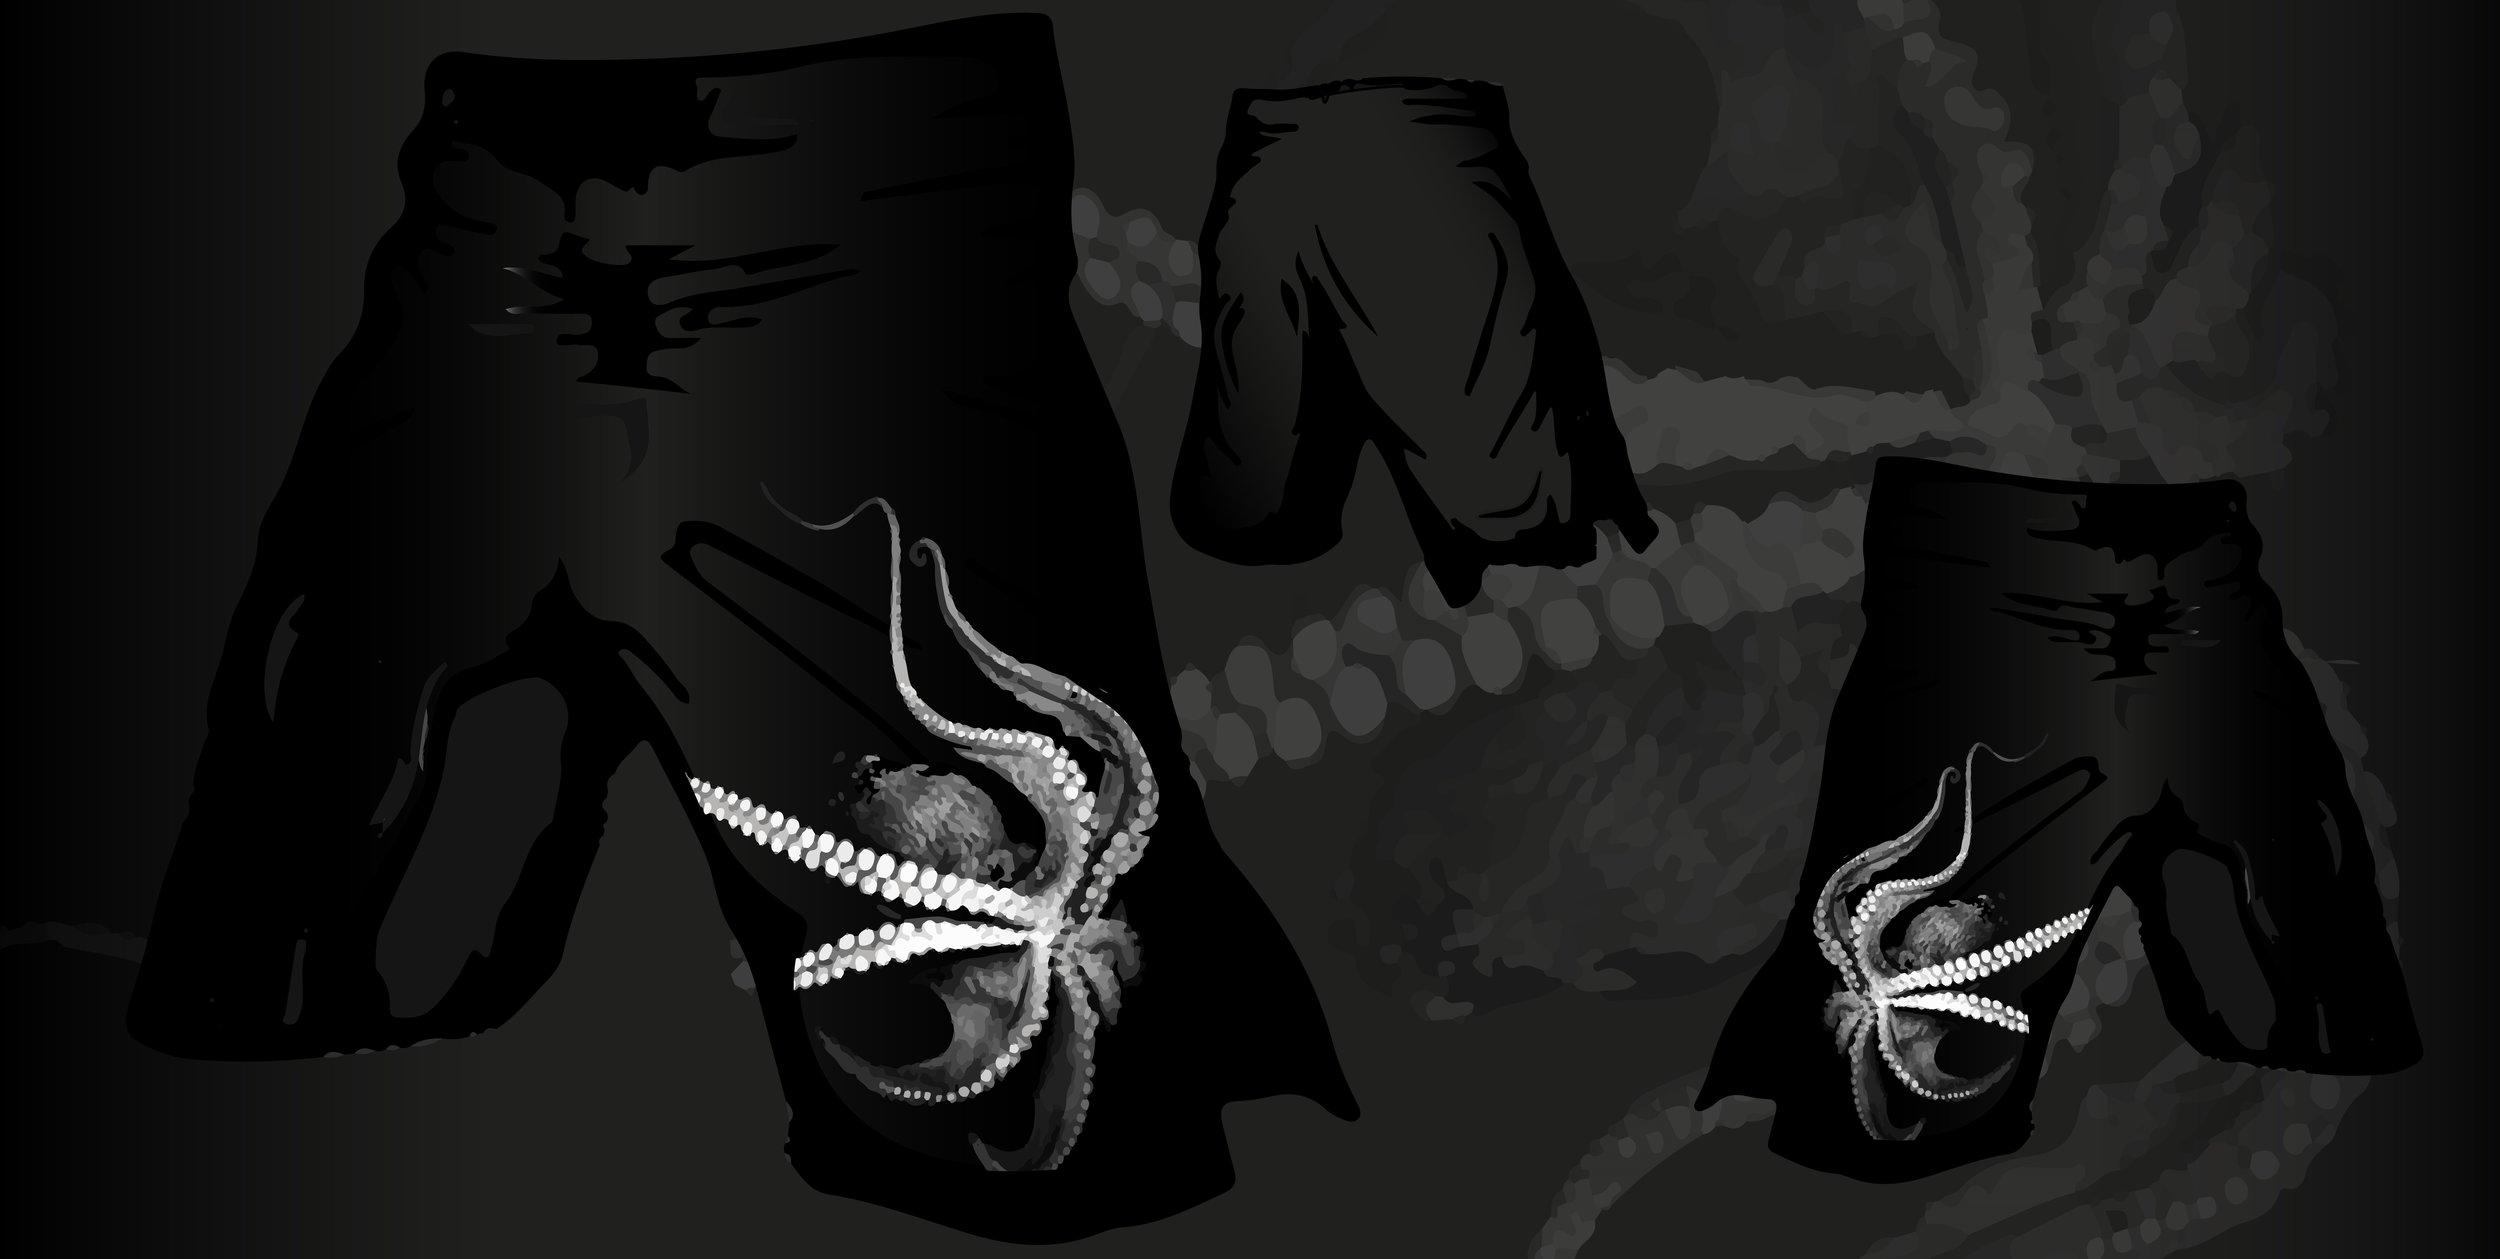 facebook timeline master 2018 black octo long shorts - Copy.jpg